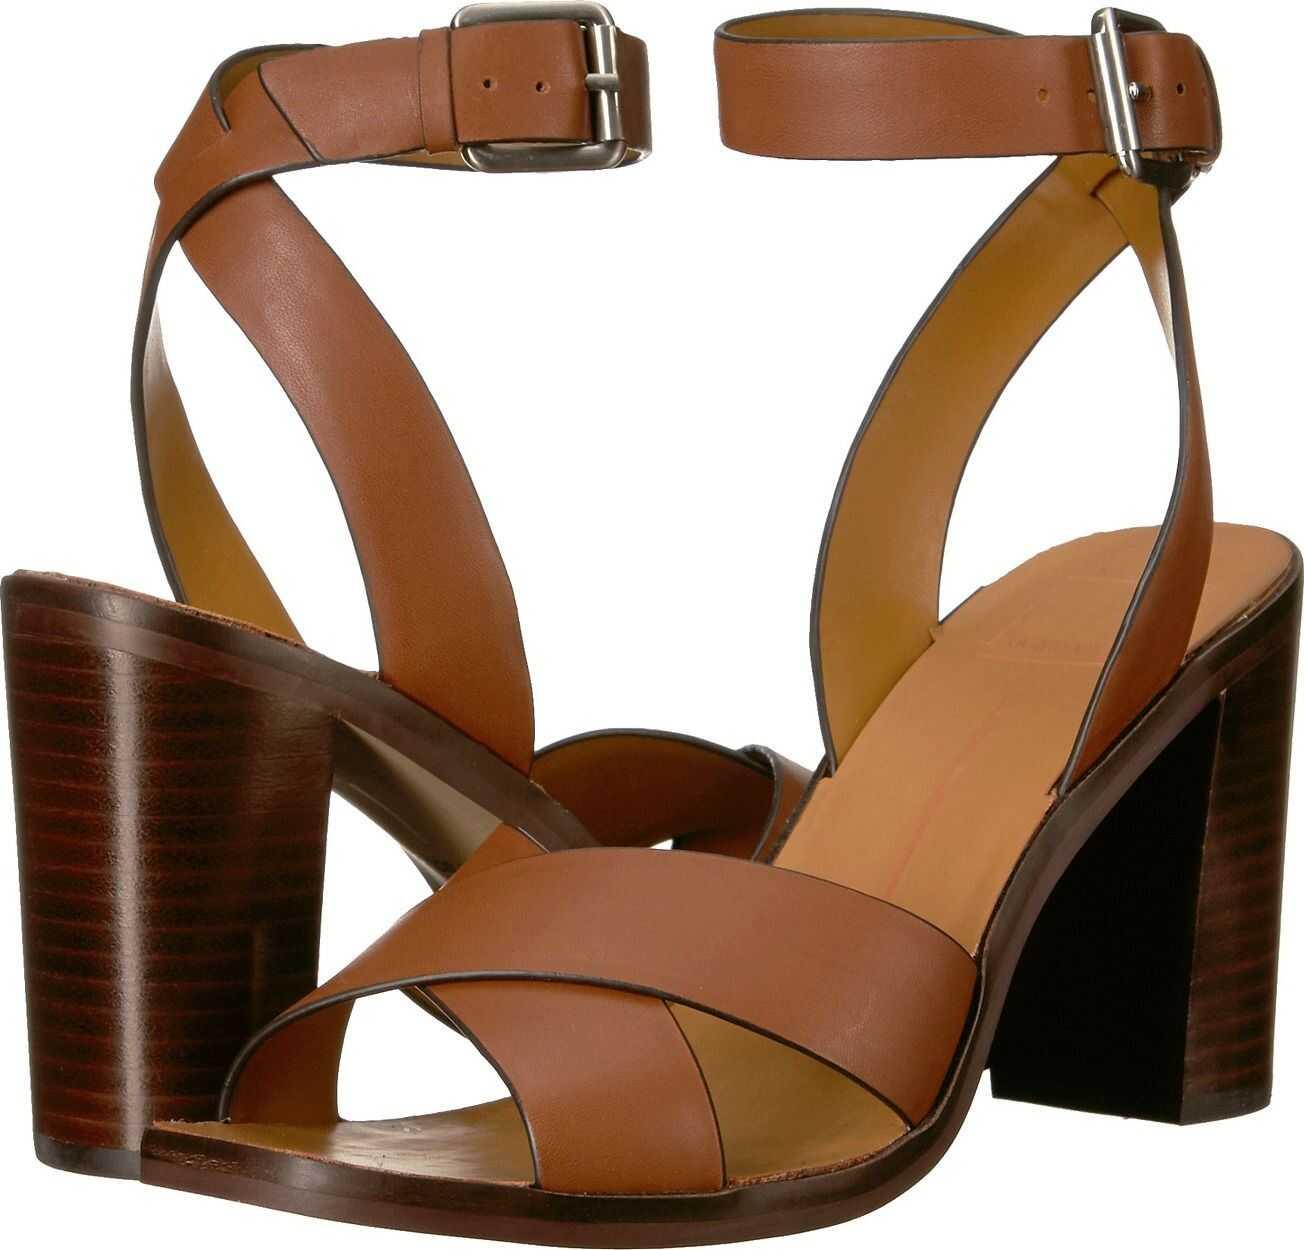 Dolce Vita Nala Brown Leather